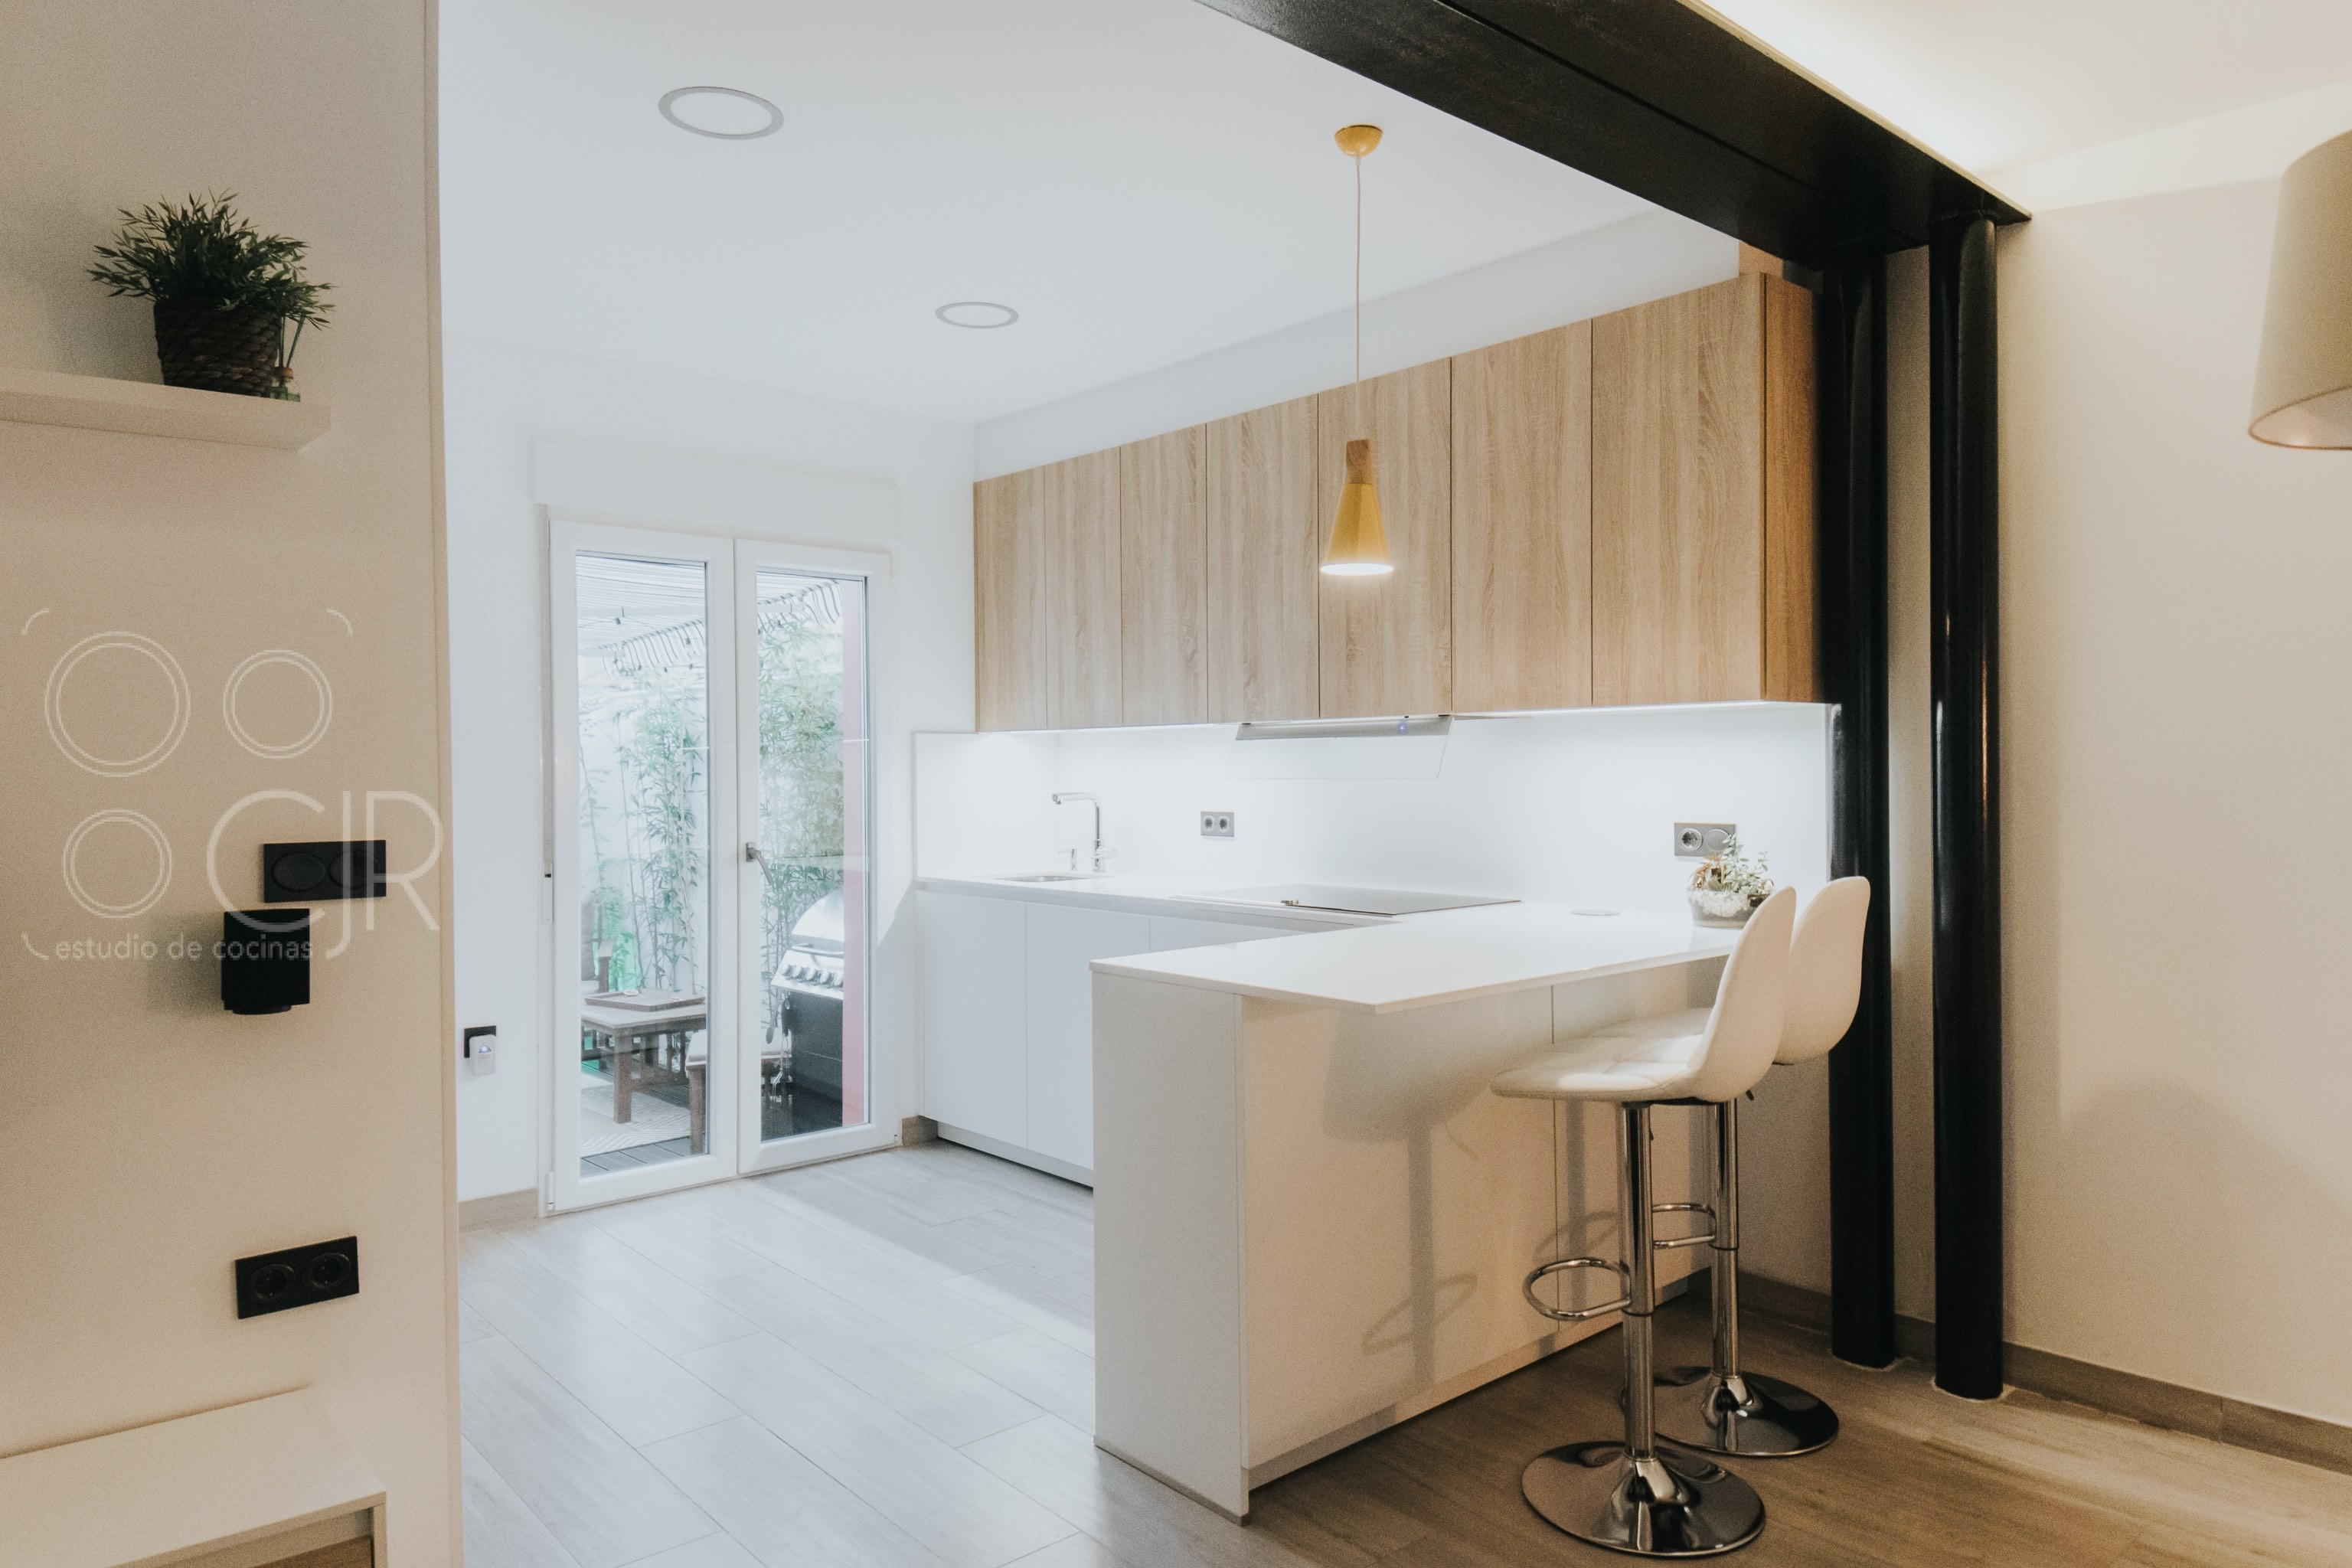 cocina abierta al salon modernas